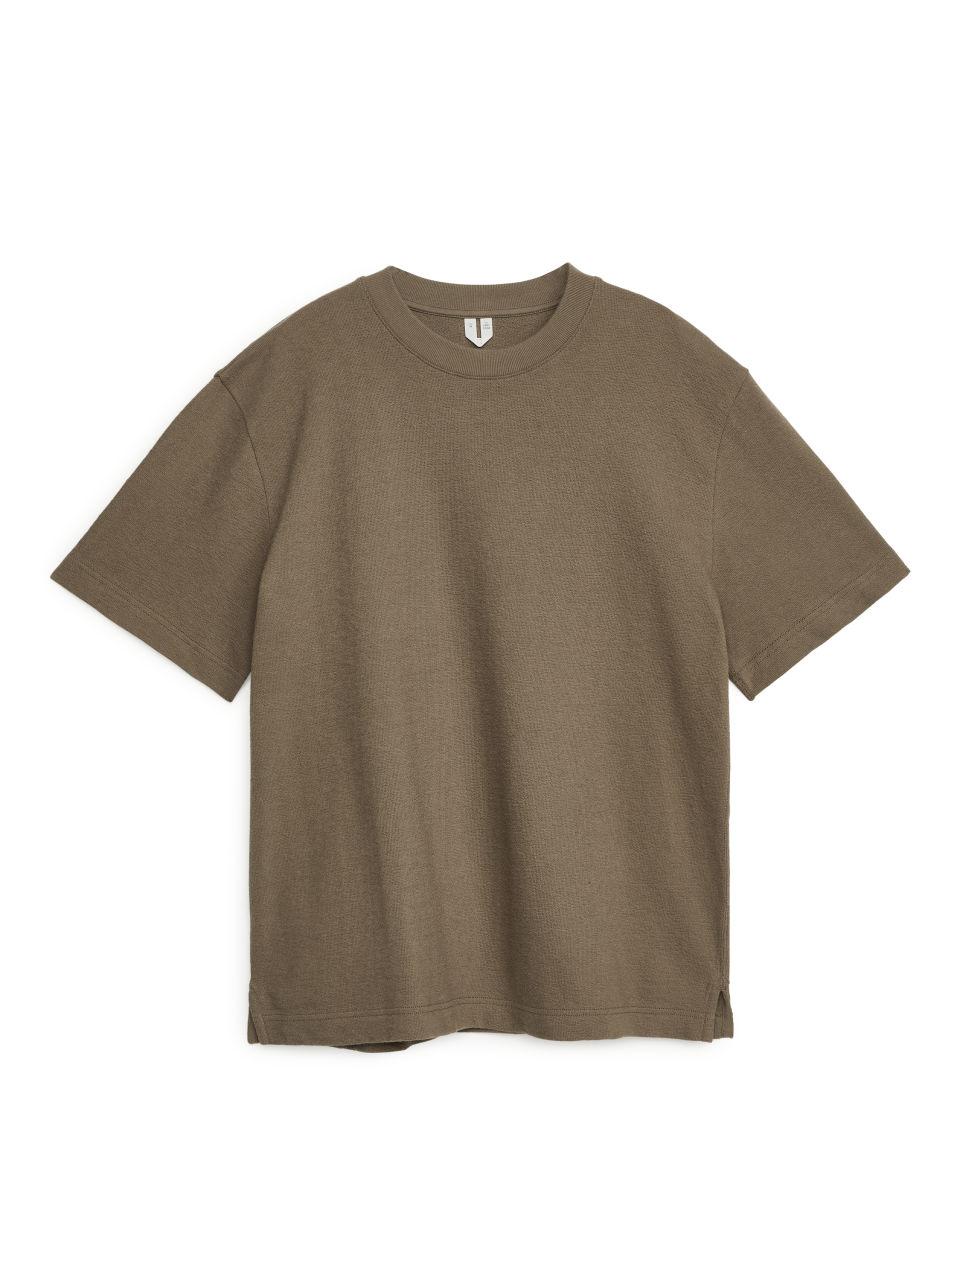 Cotton Towelling T-Shirt - Beige